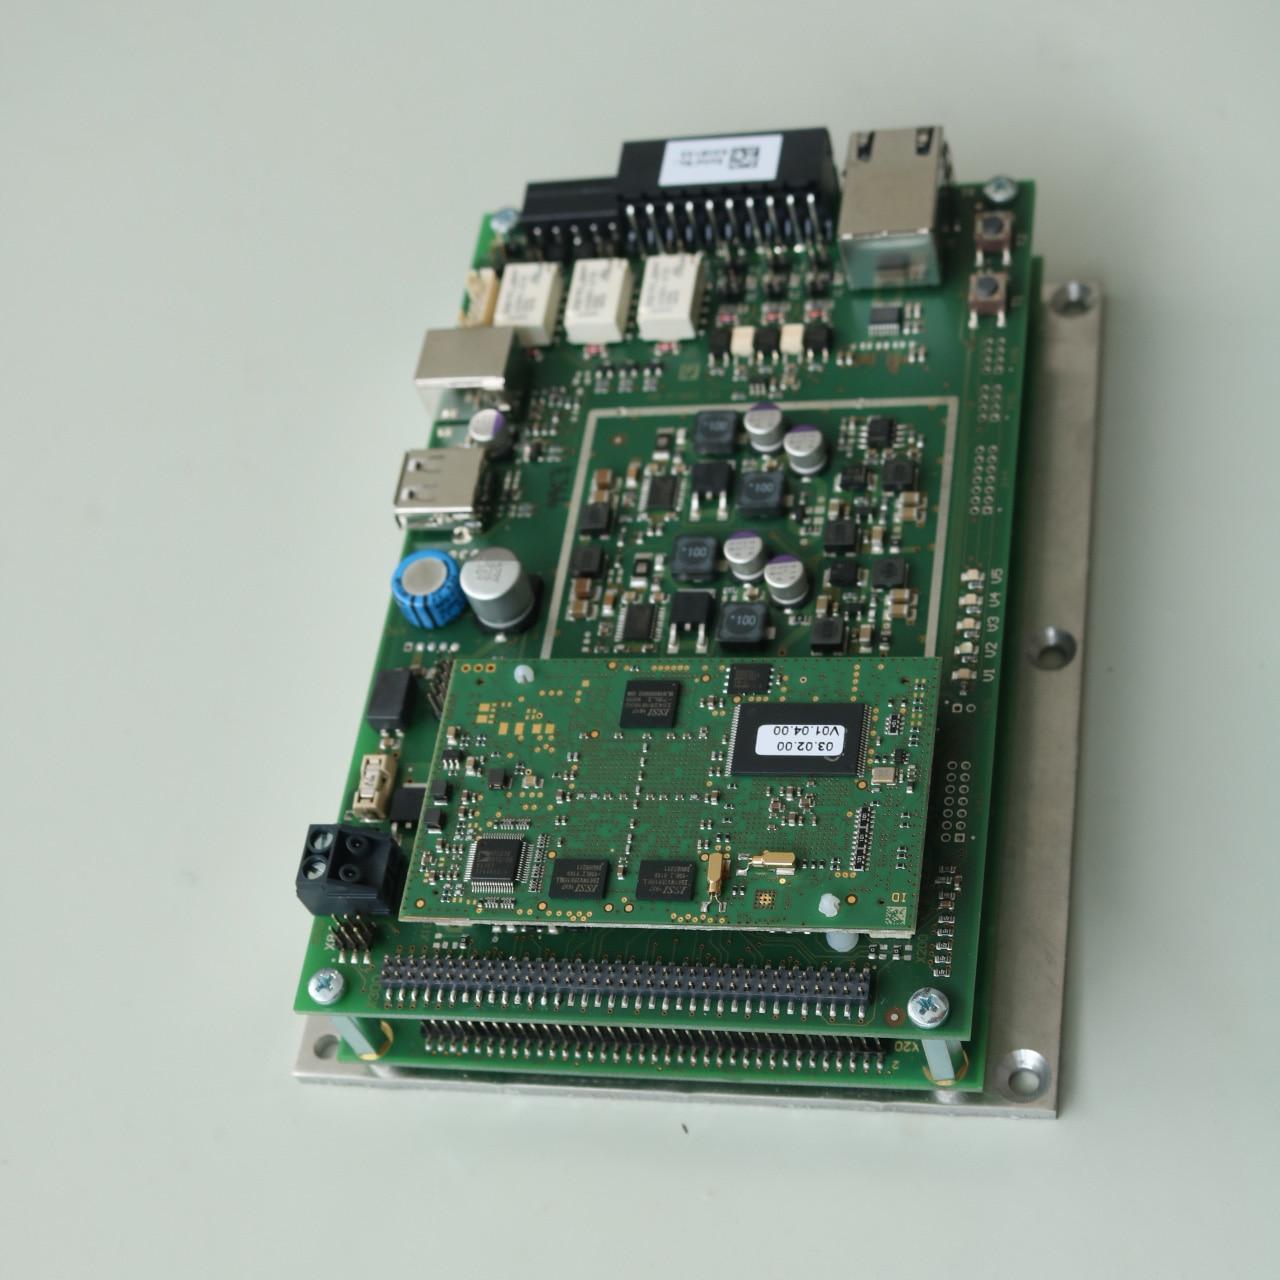 ISO15693 Long Range Readermodul, Premium 2500A 1-12W RFID READER